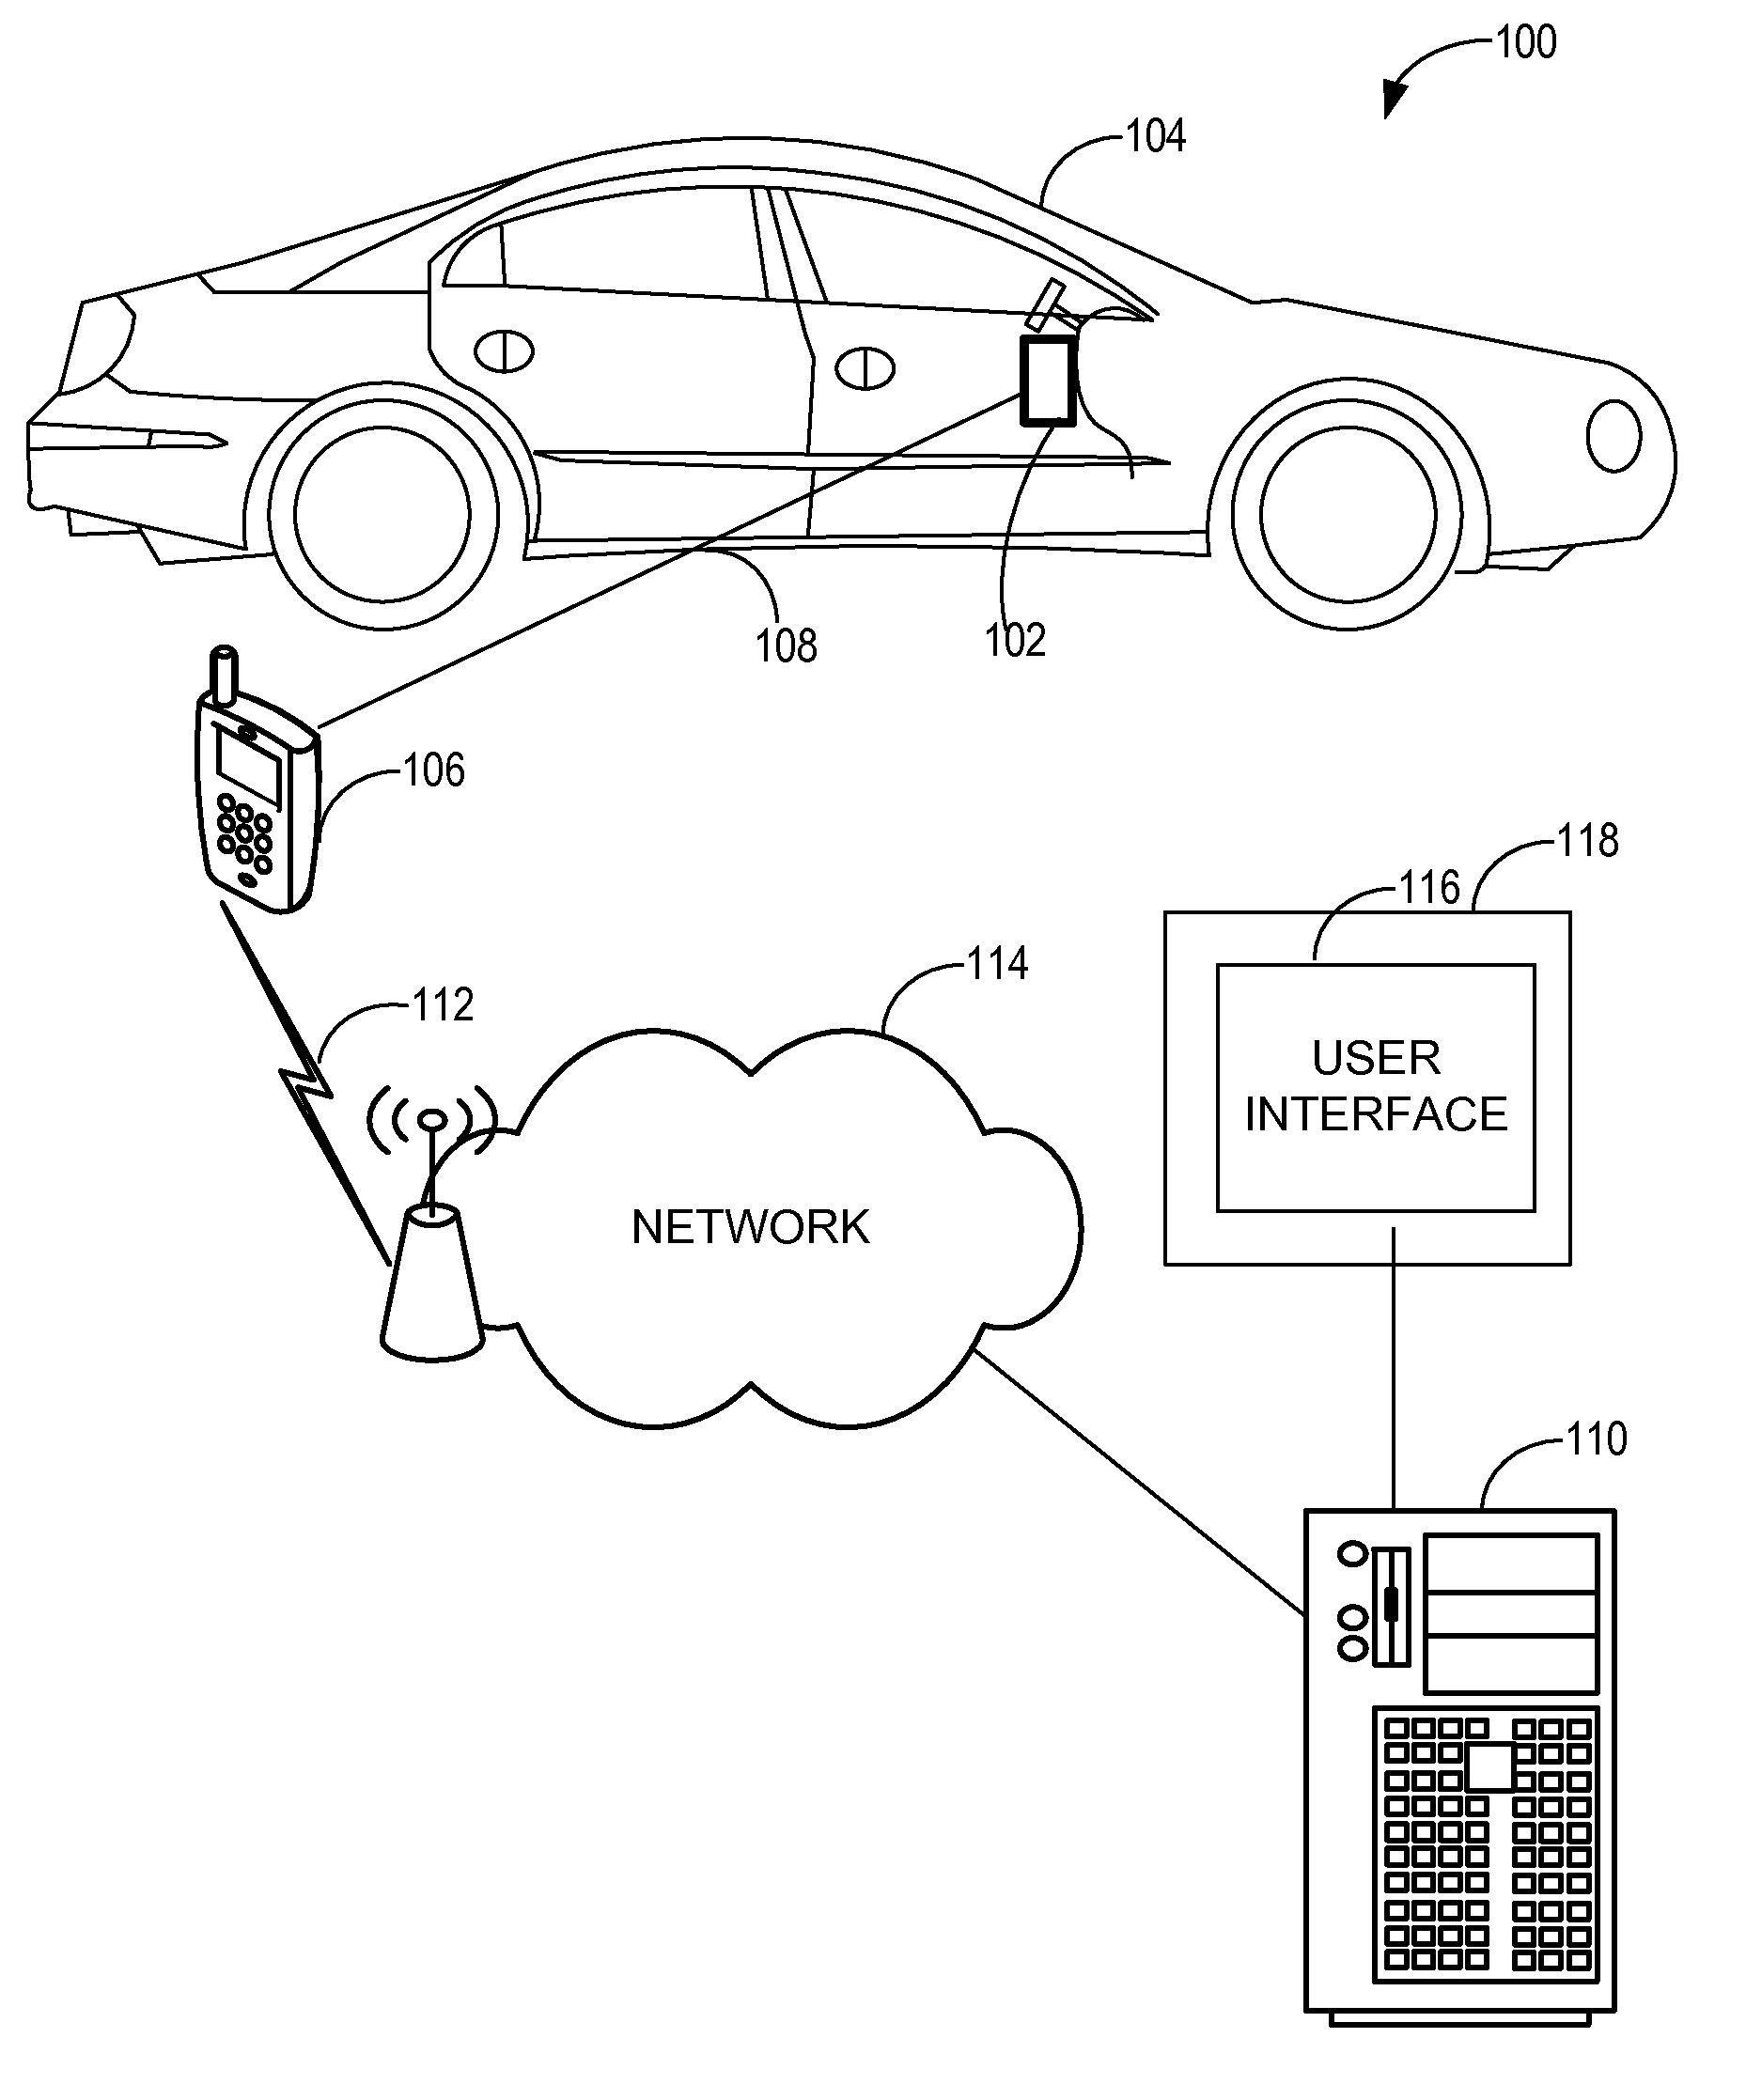 hard drive diagram 94 vw jetta parts data plug wiring diagrams get free image